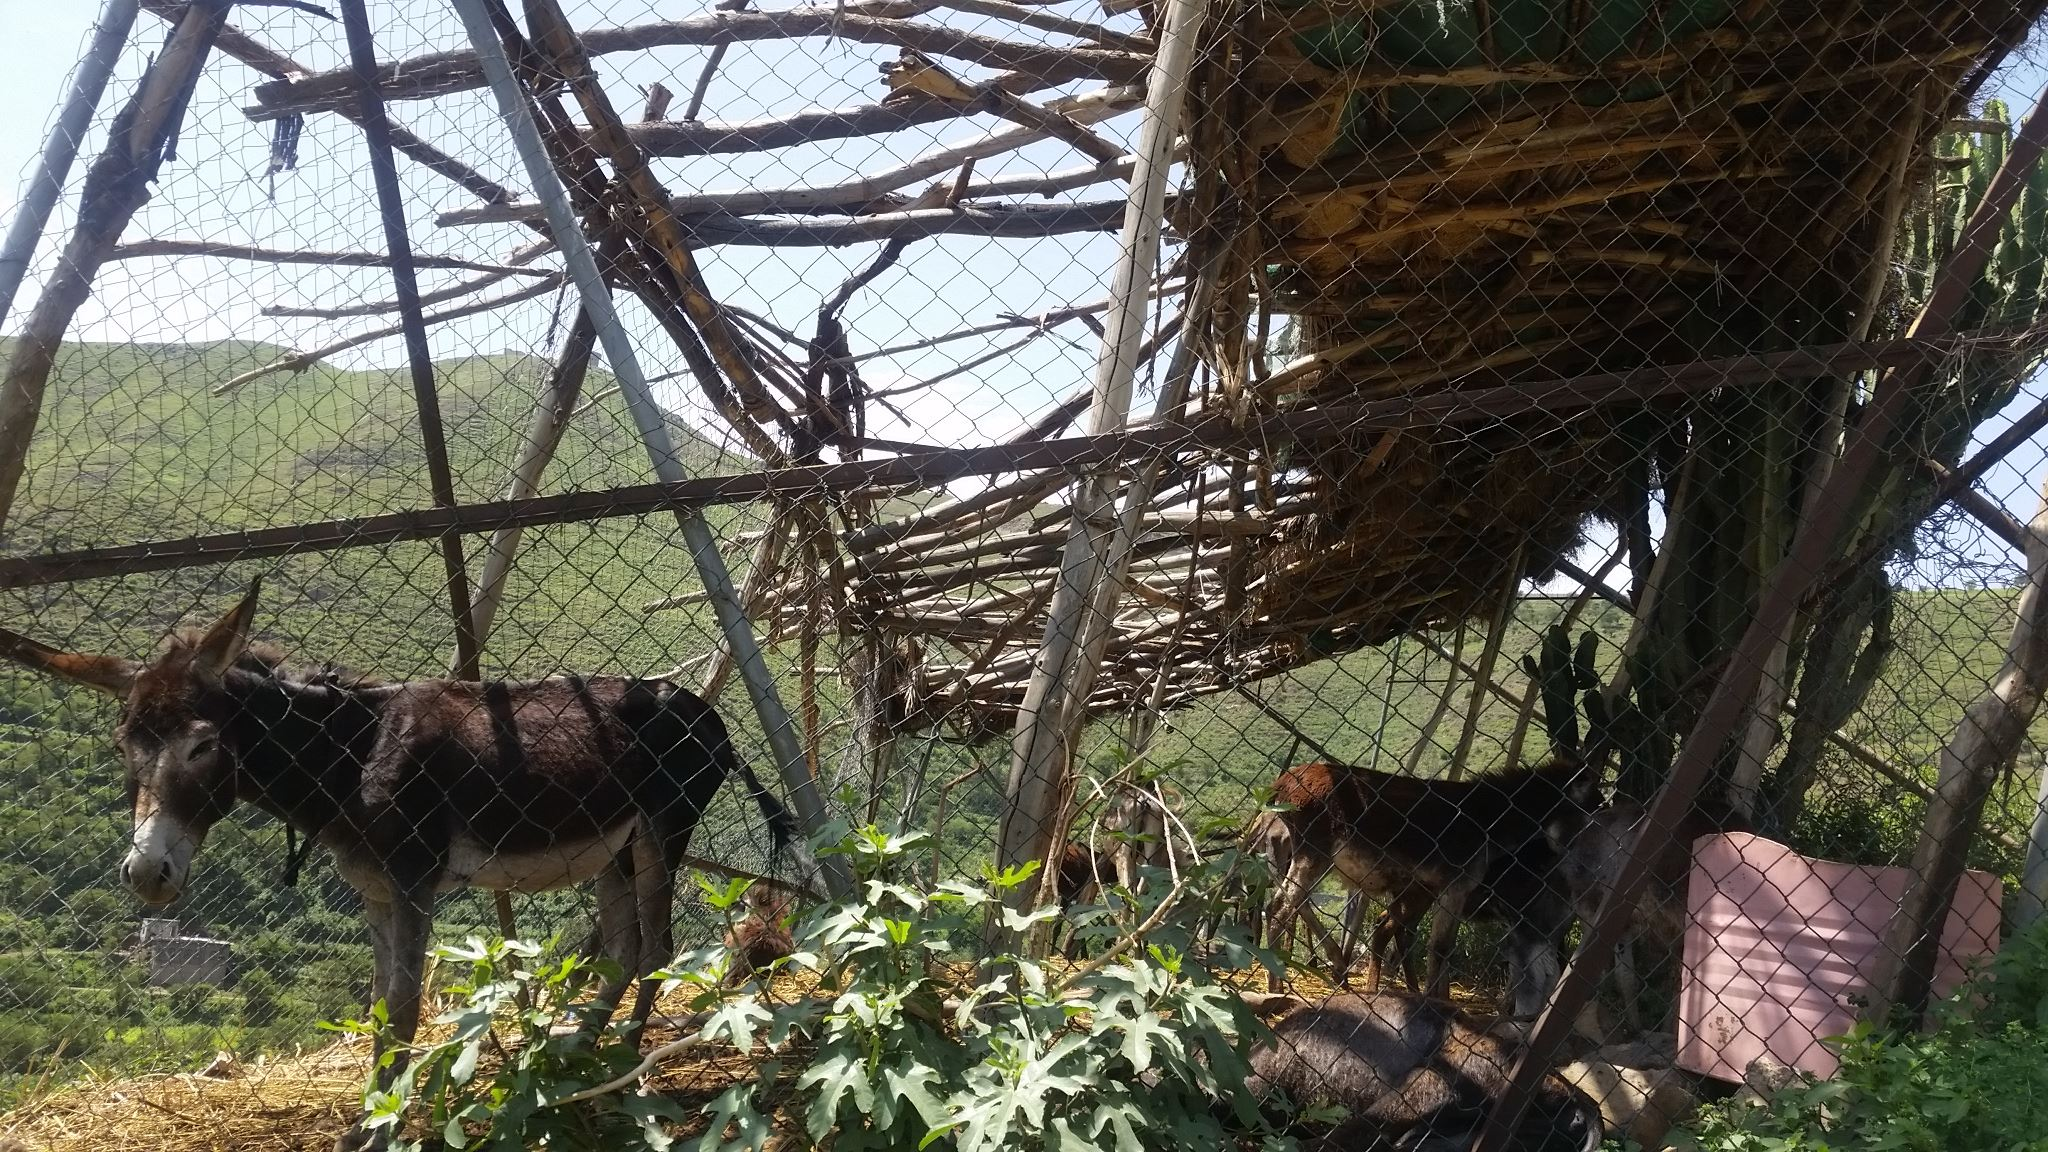 Ibb Zoo baboon wildcat enclosure project.jpg